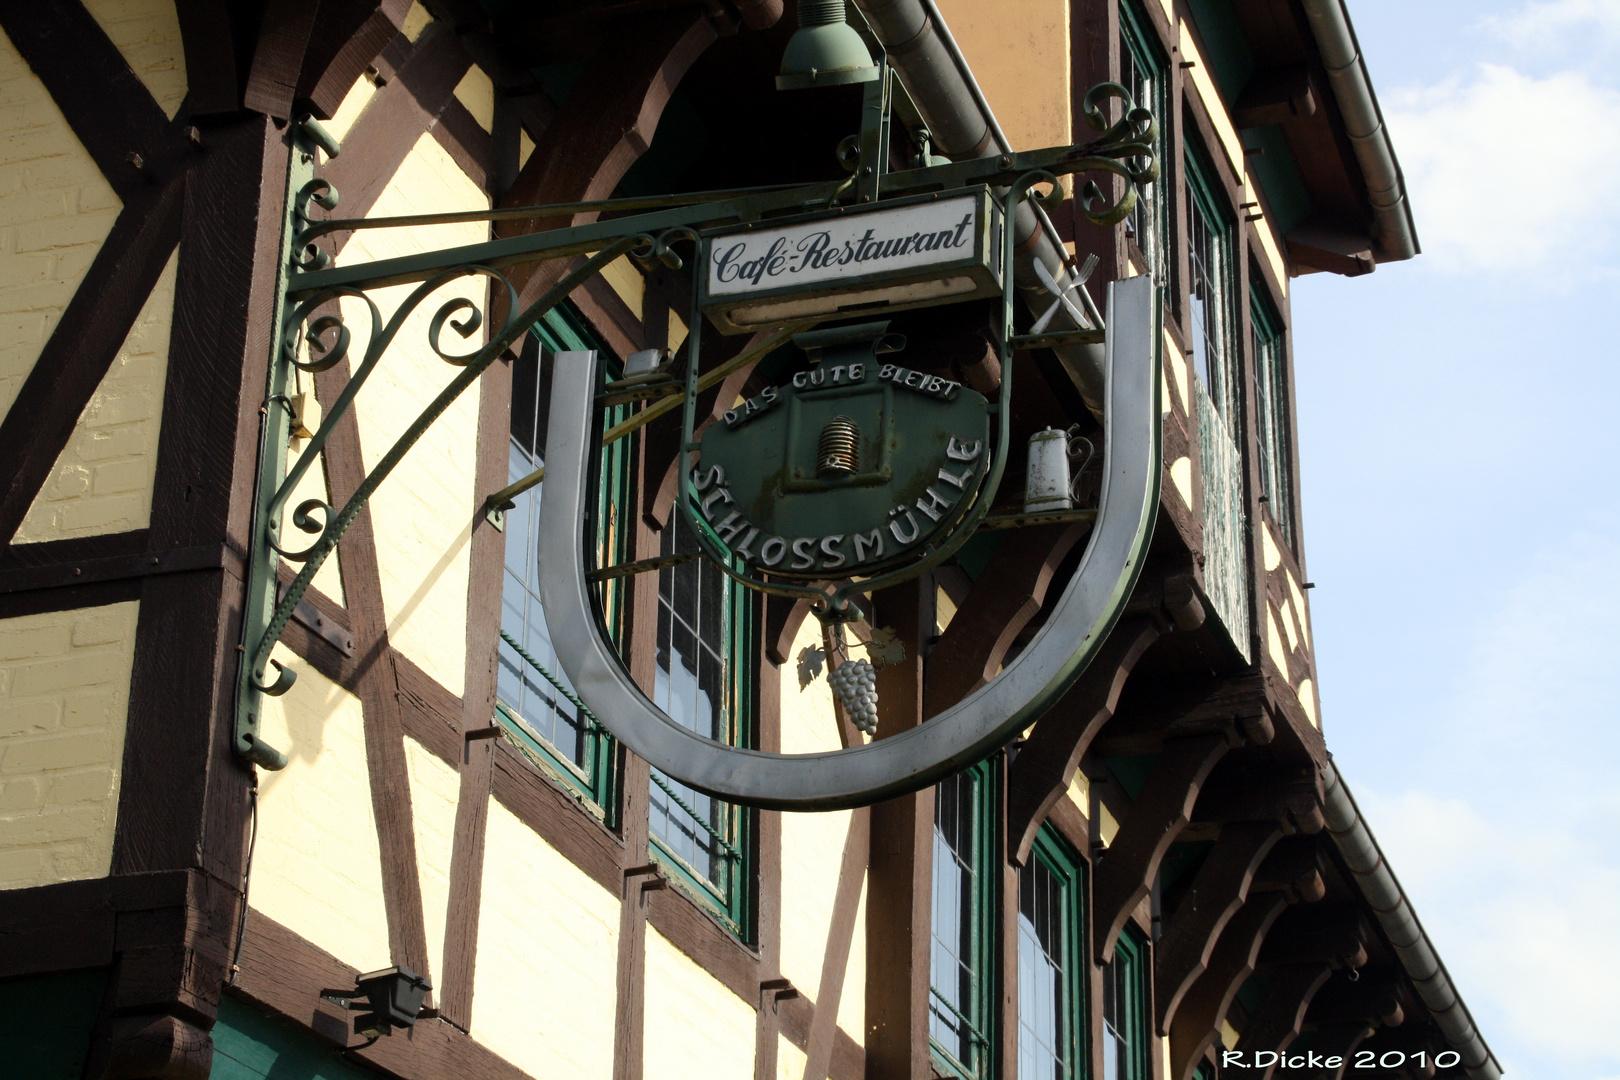 Cafe Schloßmühle